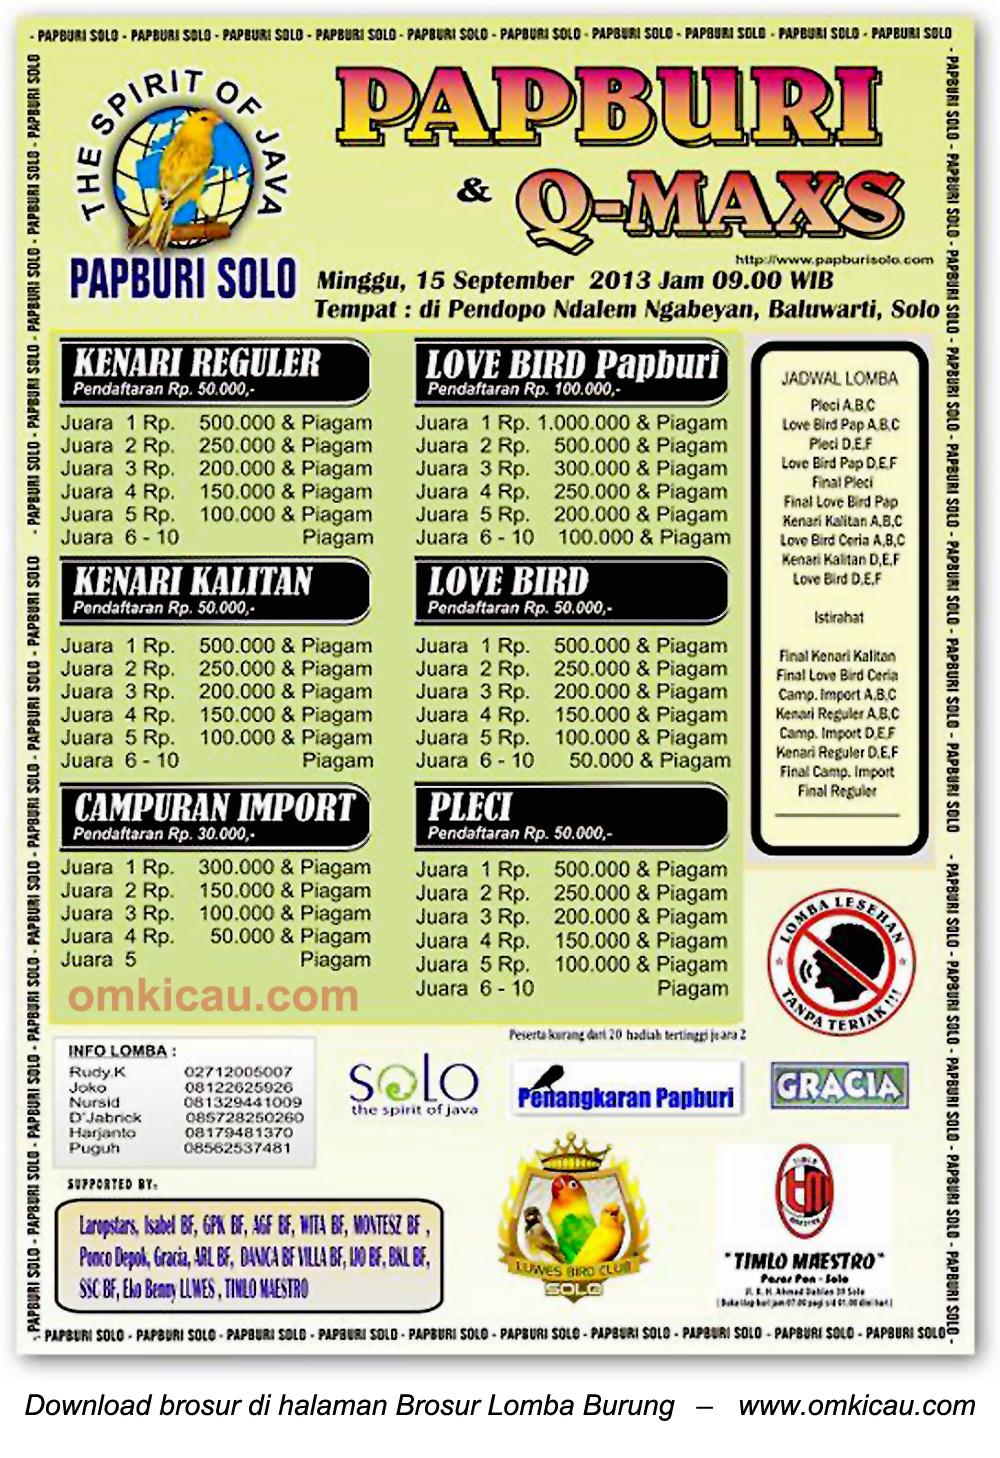 Brosur Lomba Burung Berkicau Papburi Solo 15 September 2013